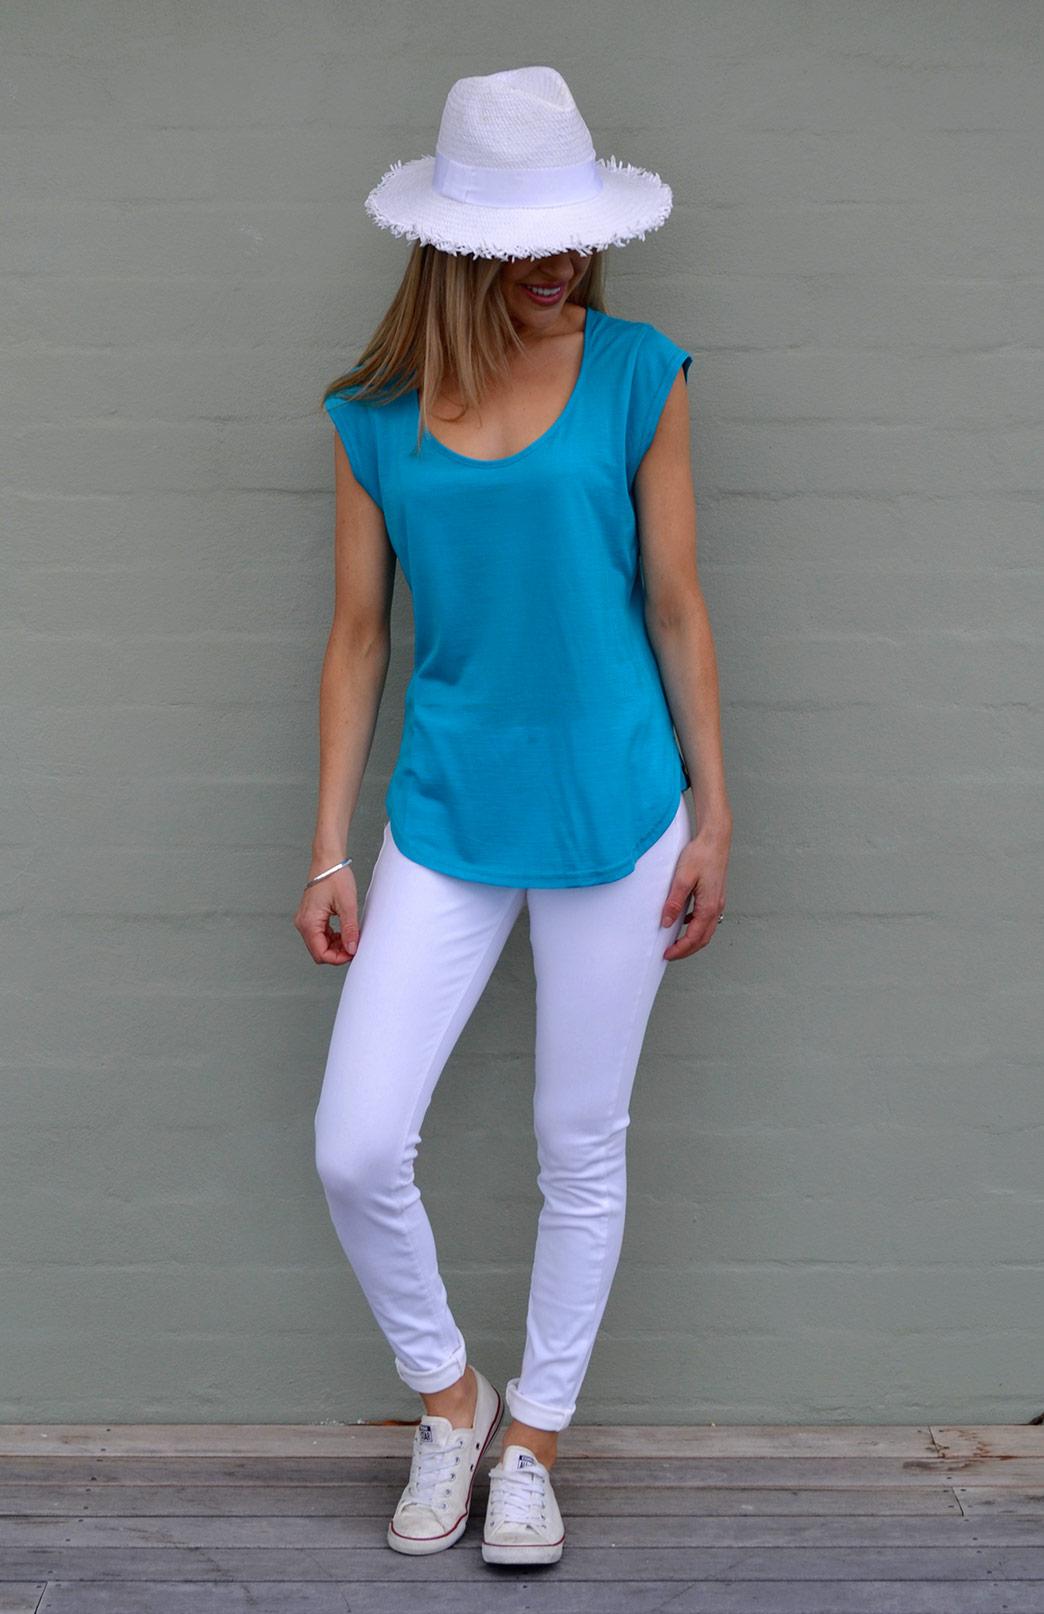 Cap Sleeve T-Shirt - Women's Cap Sleeve Merino Modal Blend Spring Summer Top - Smitten Merino Tasmania Australia